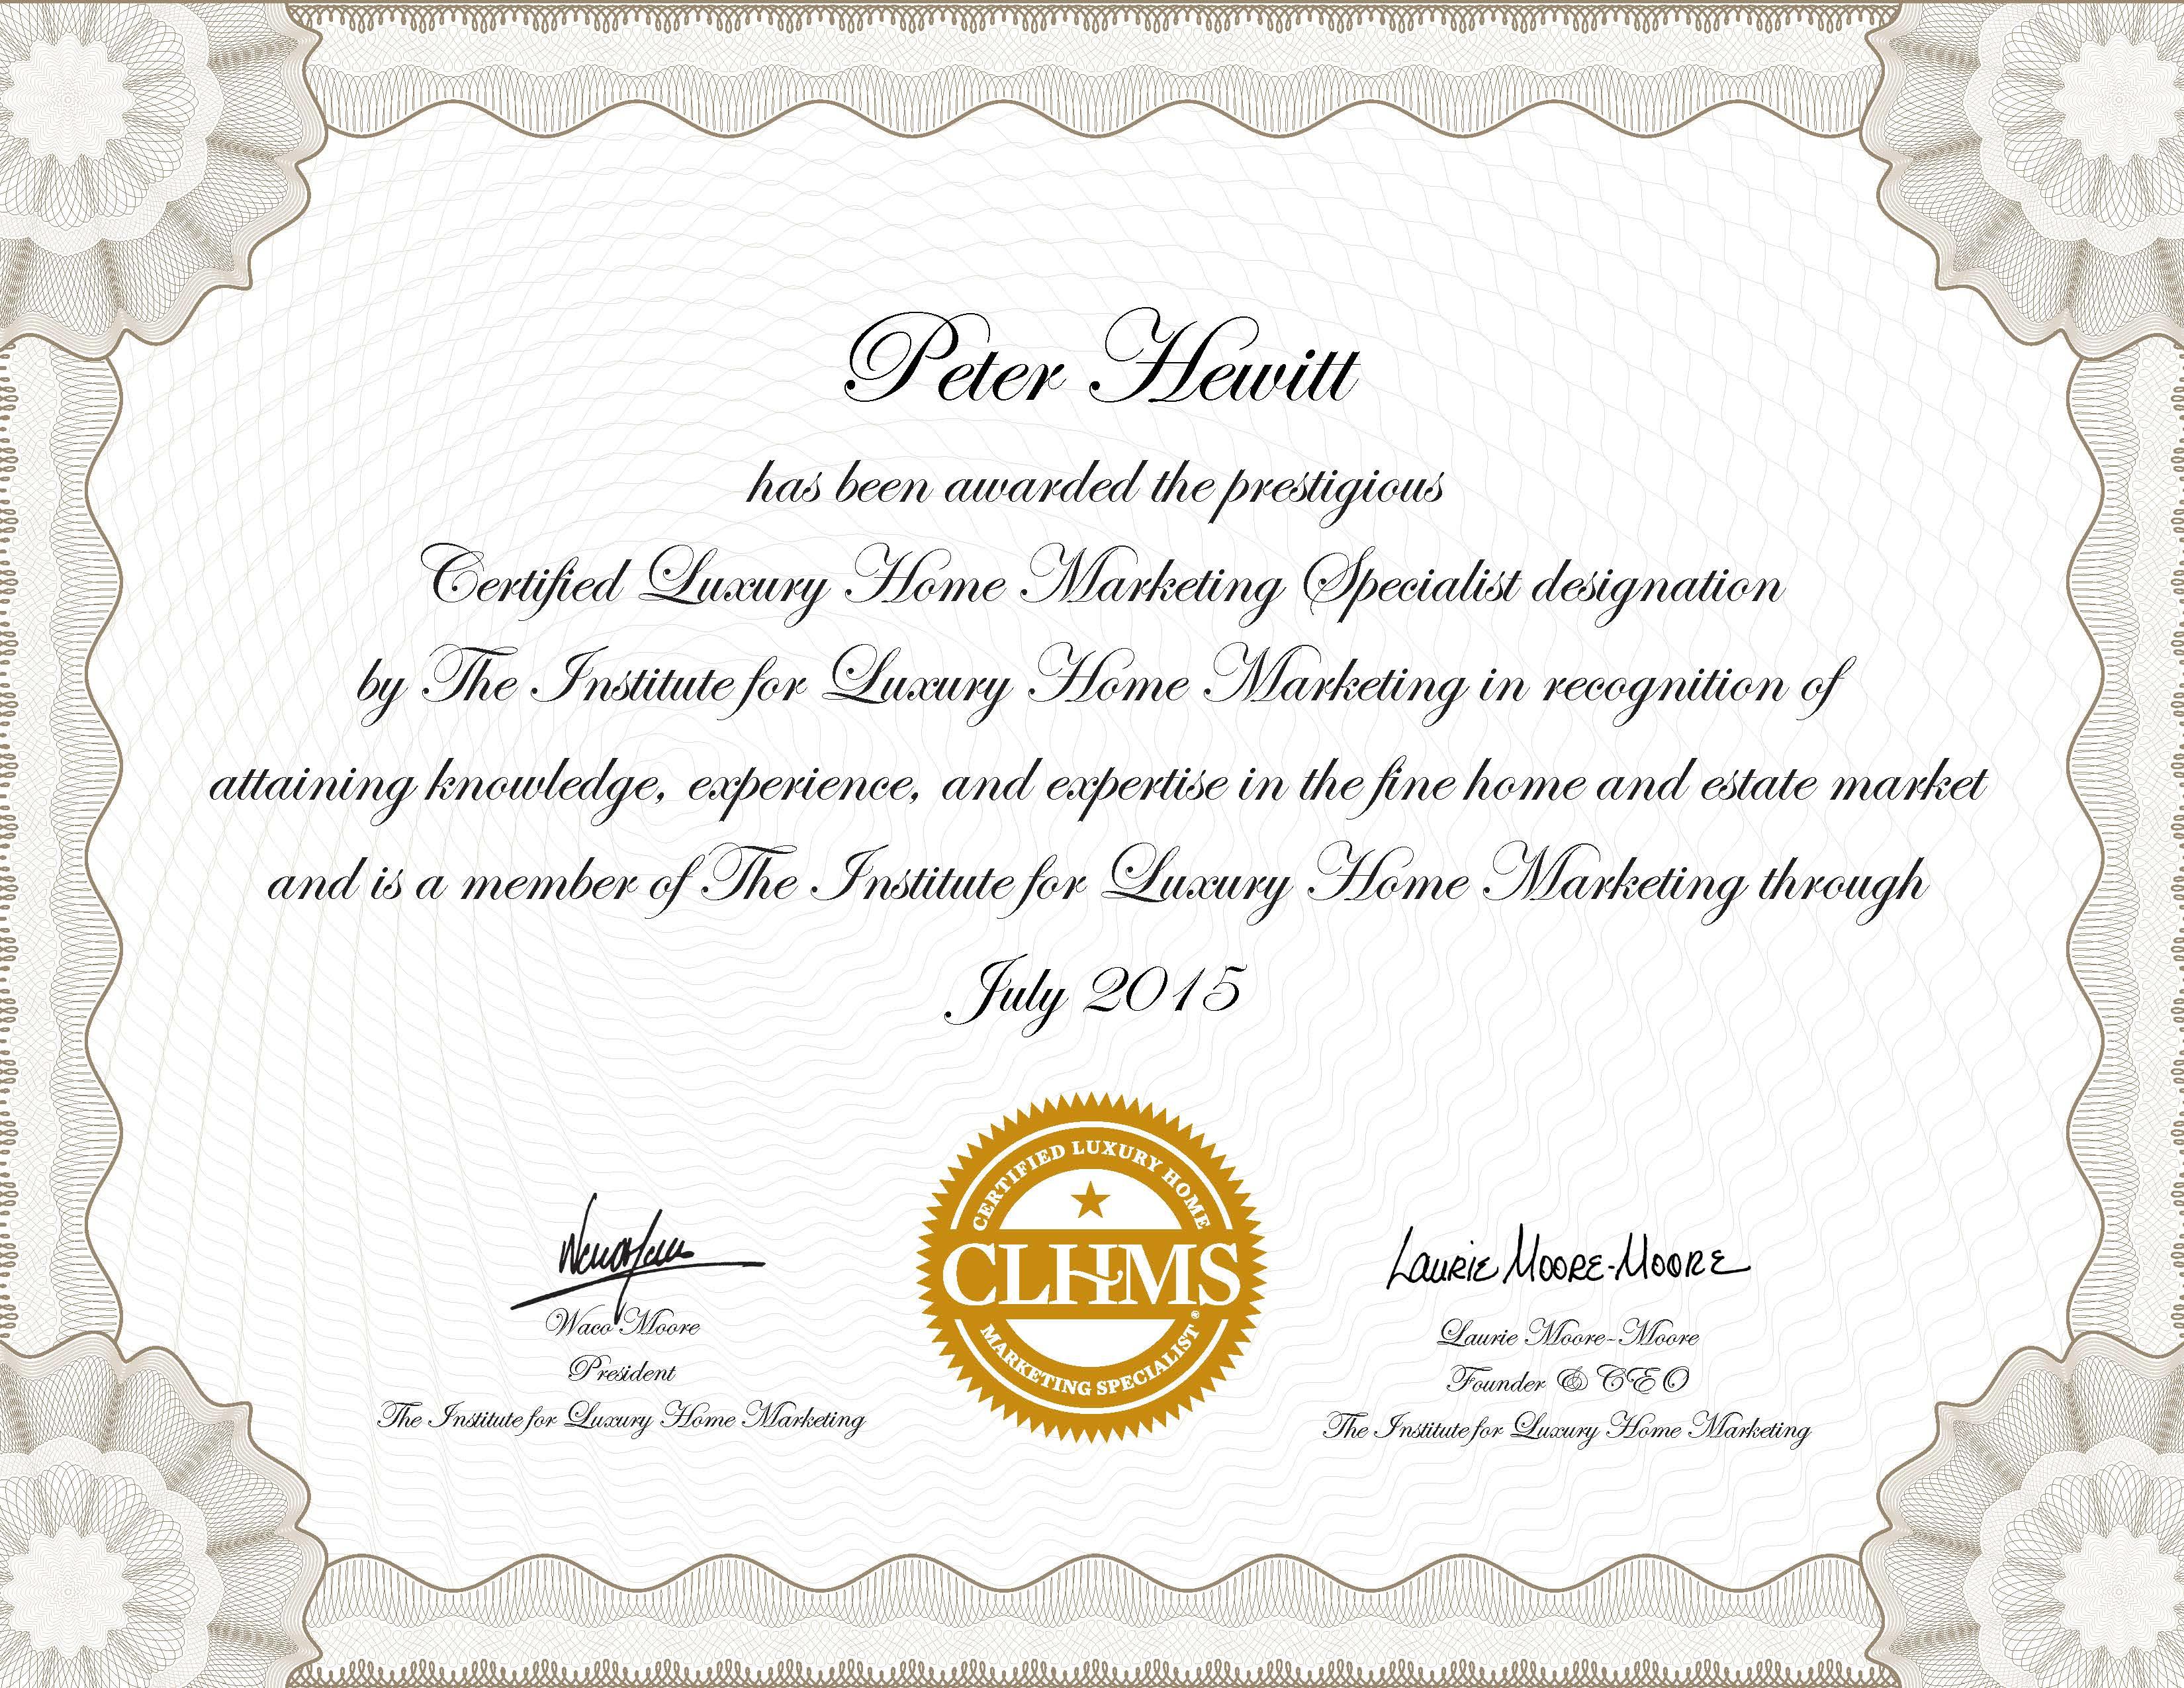 LHD Certificate.jpg